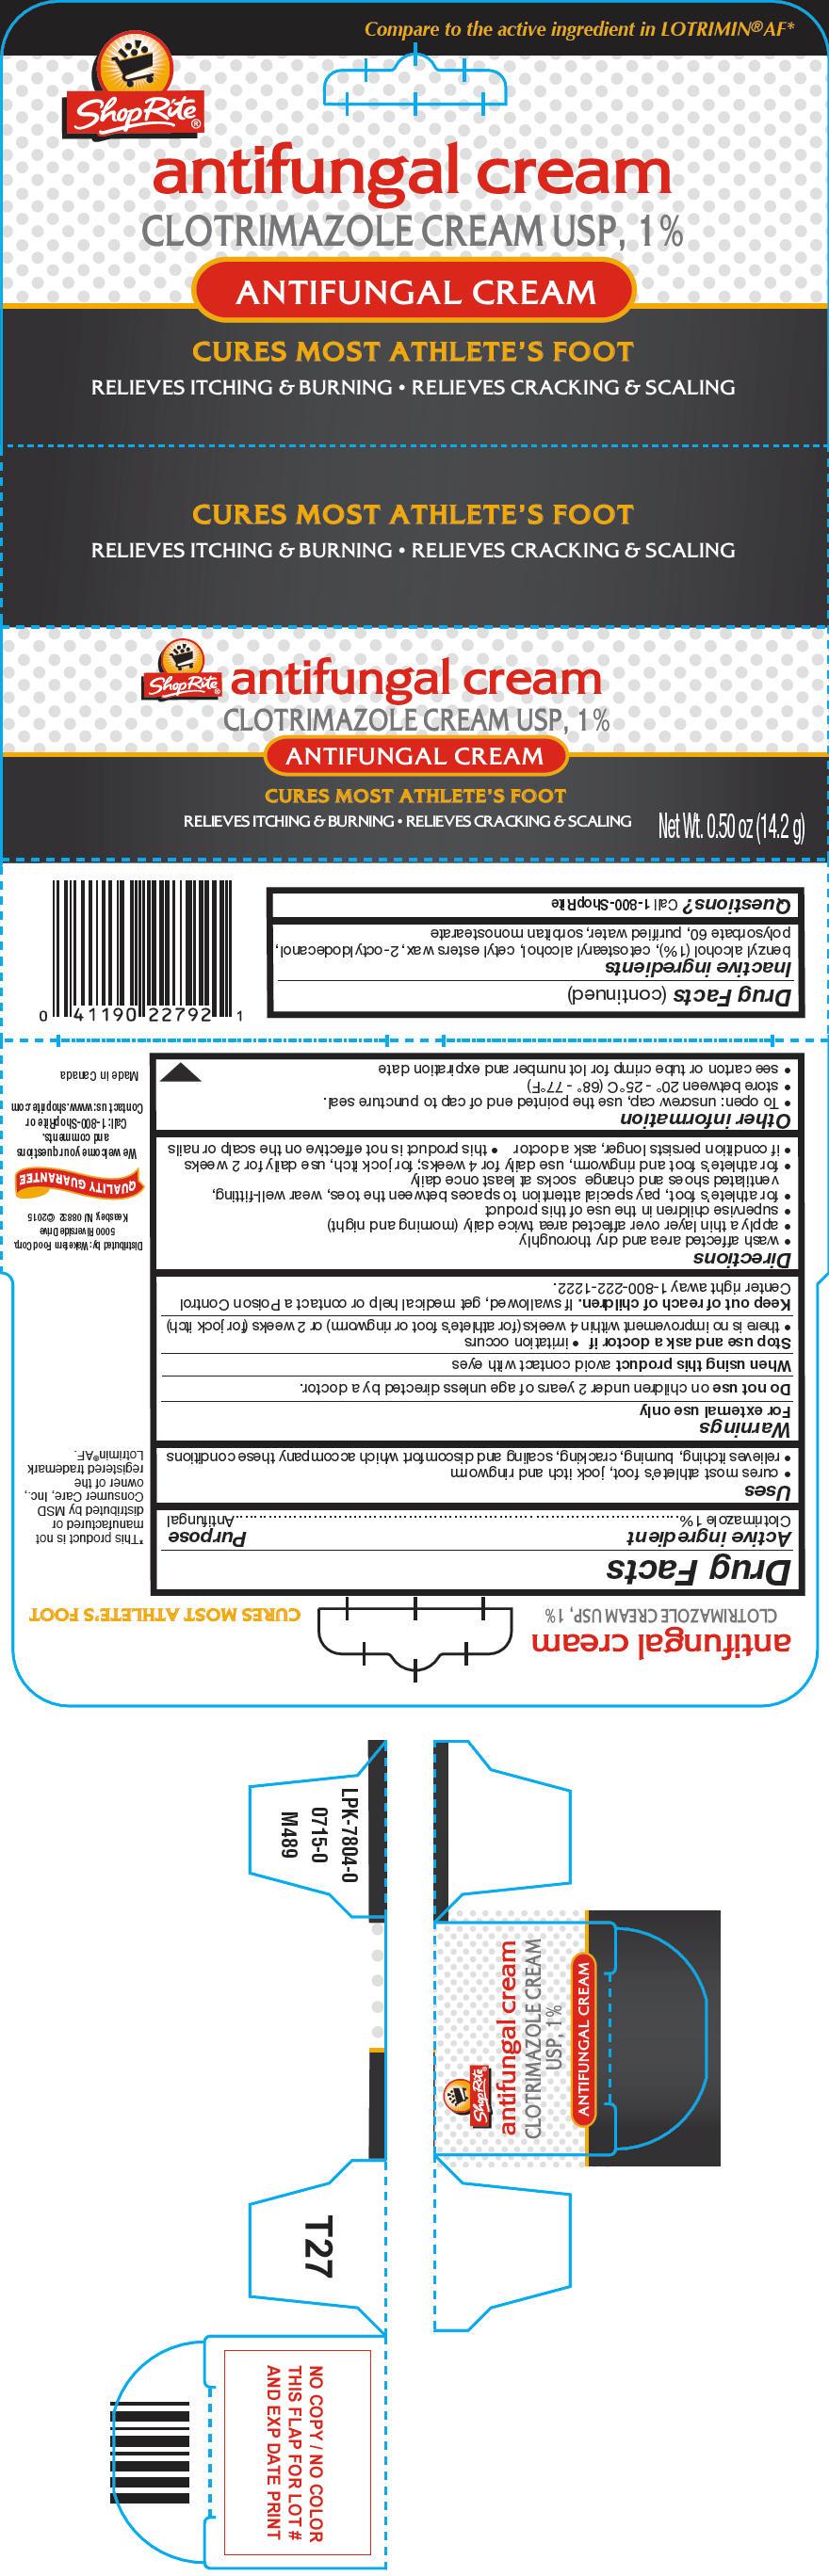 Shoprite Antifungal (Clotrimazole) Cream [Wakefern Food Corporation]